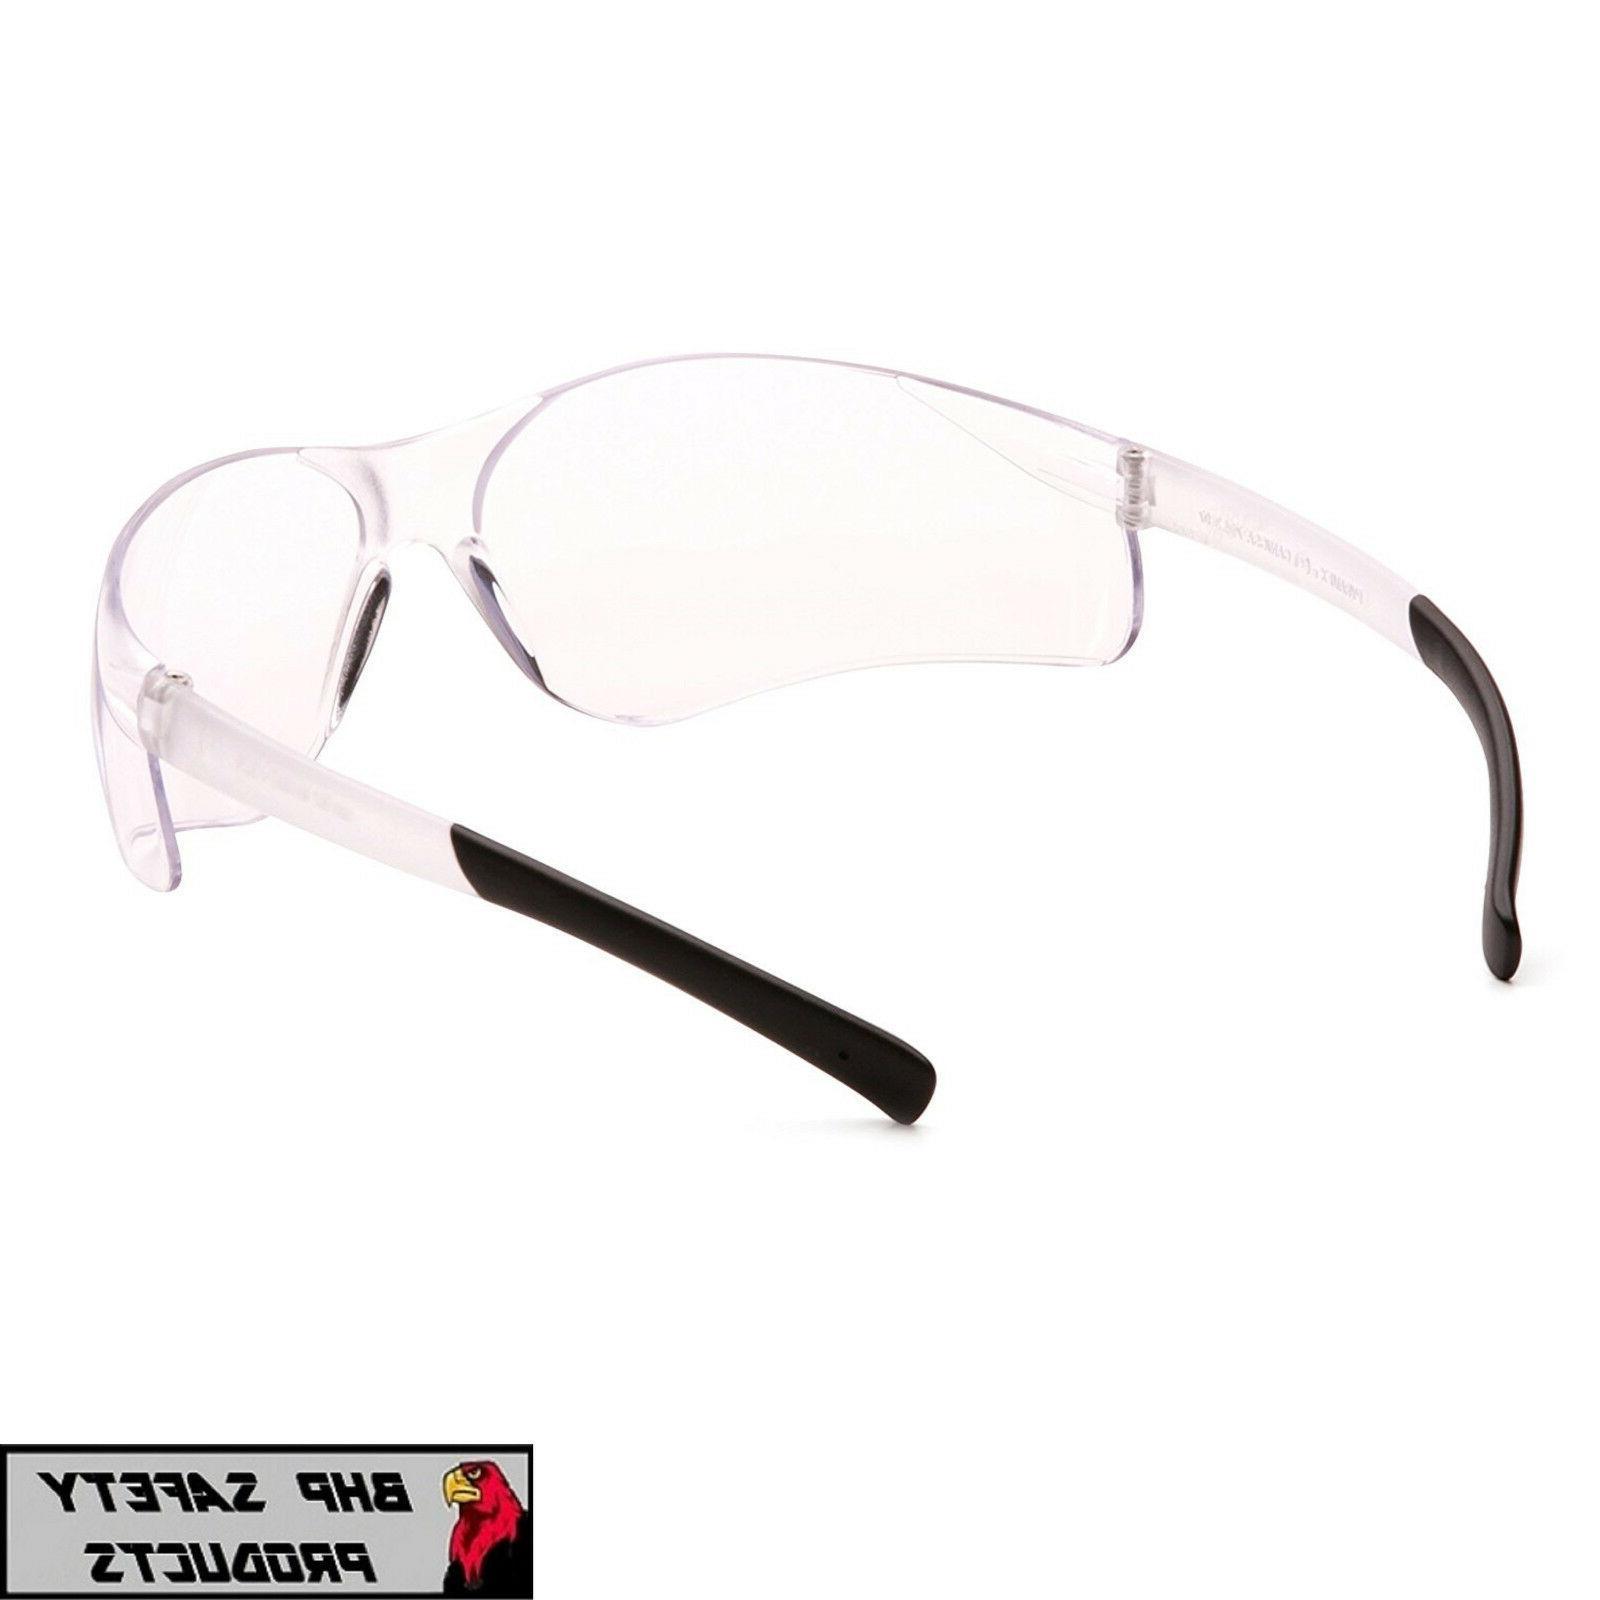 PYRAMEX ZTEK READER GLASSES CLEAR +1.50 LENS S2510R15